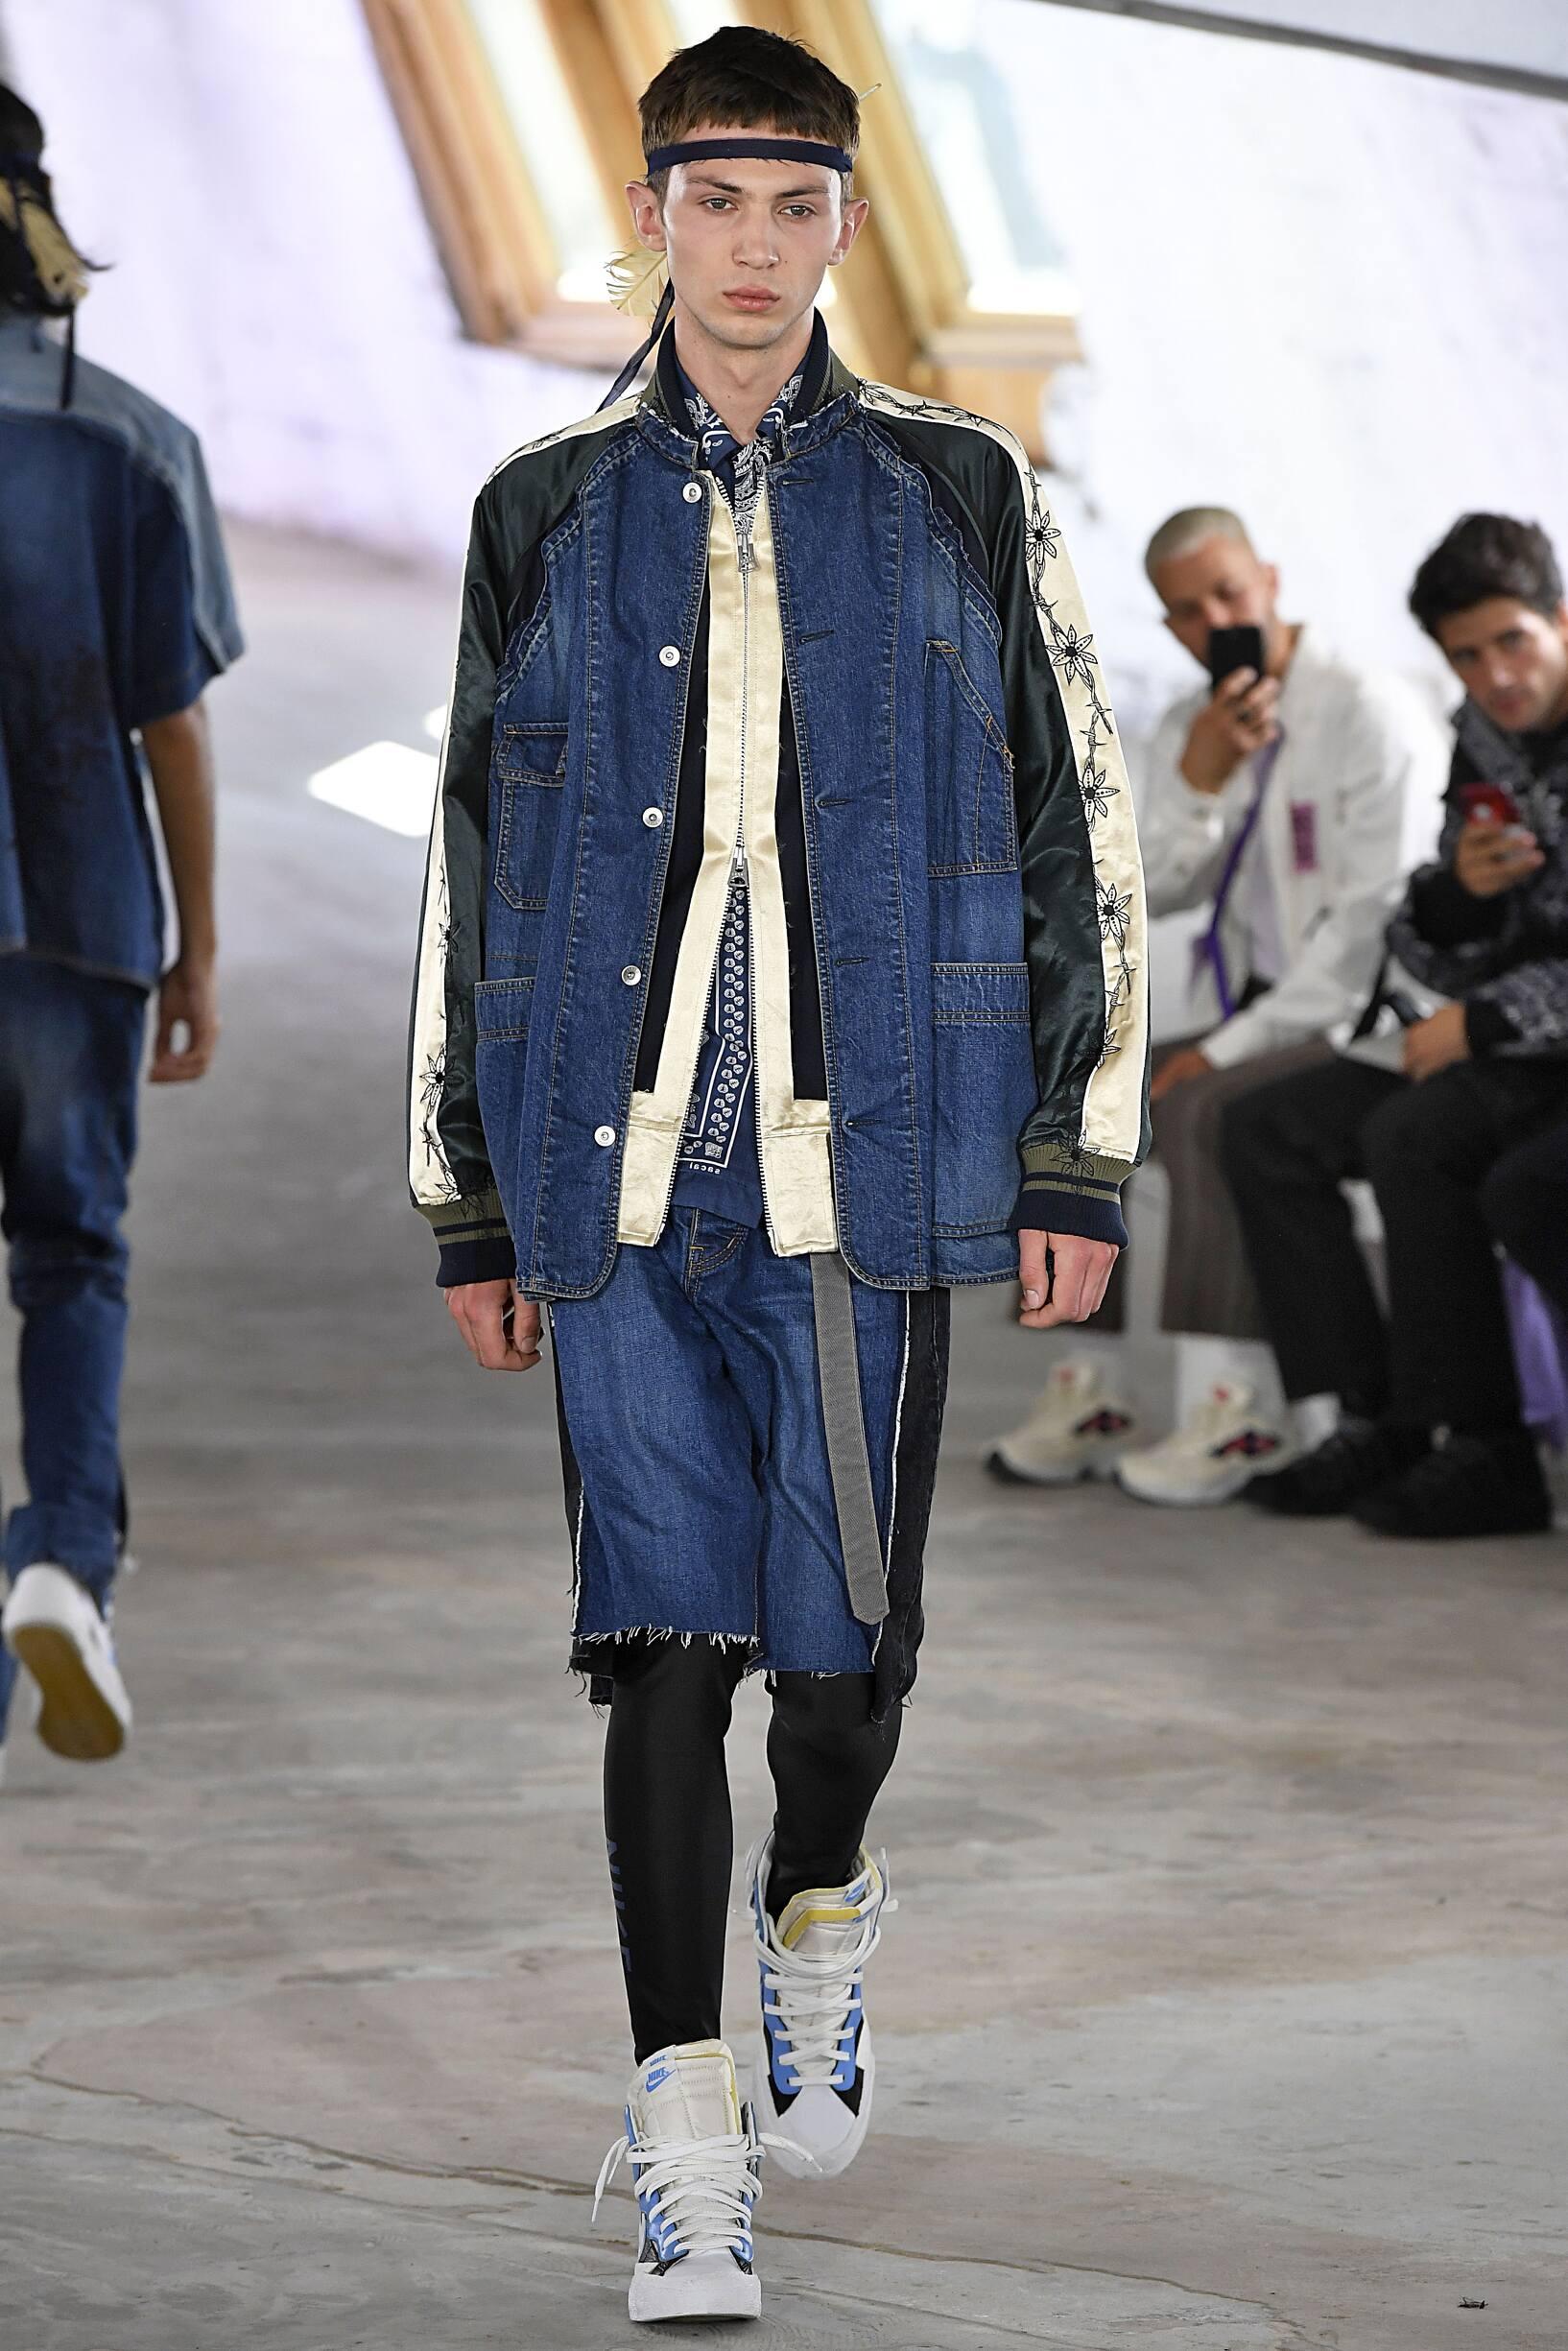 Sacai SS 2019 Menswear